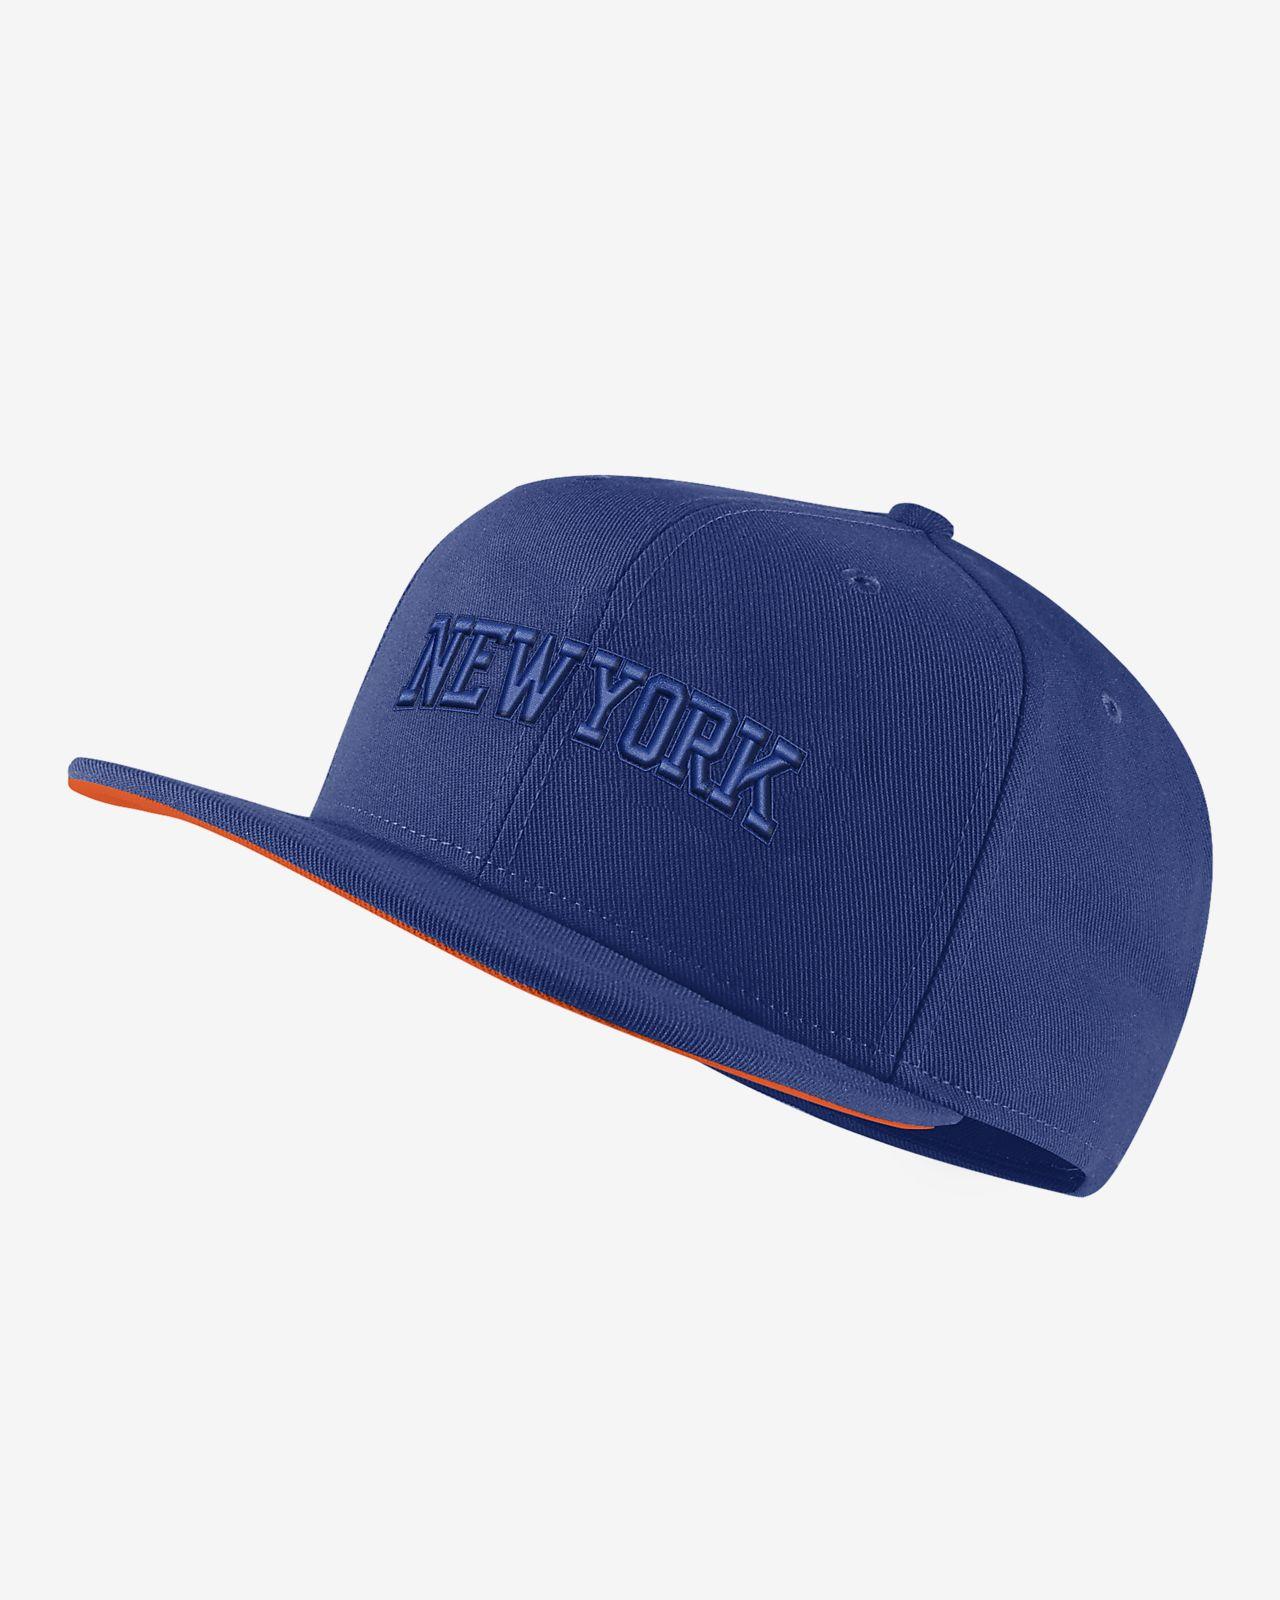 New York Knicks Nike AeroBill NBA-keps